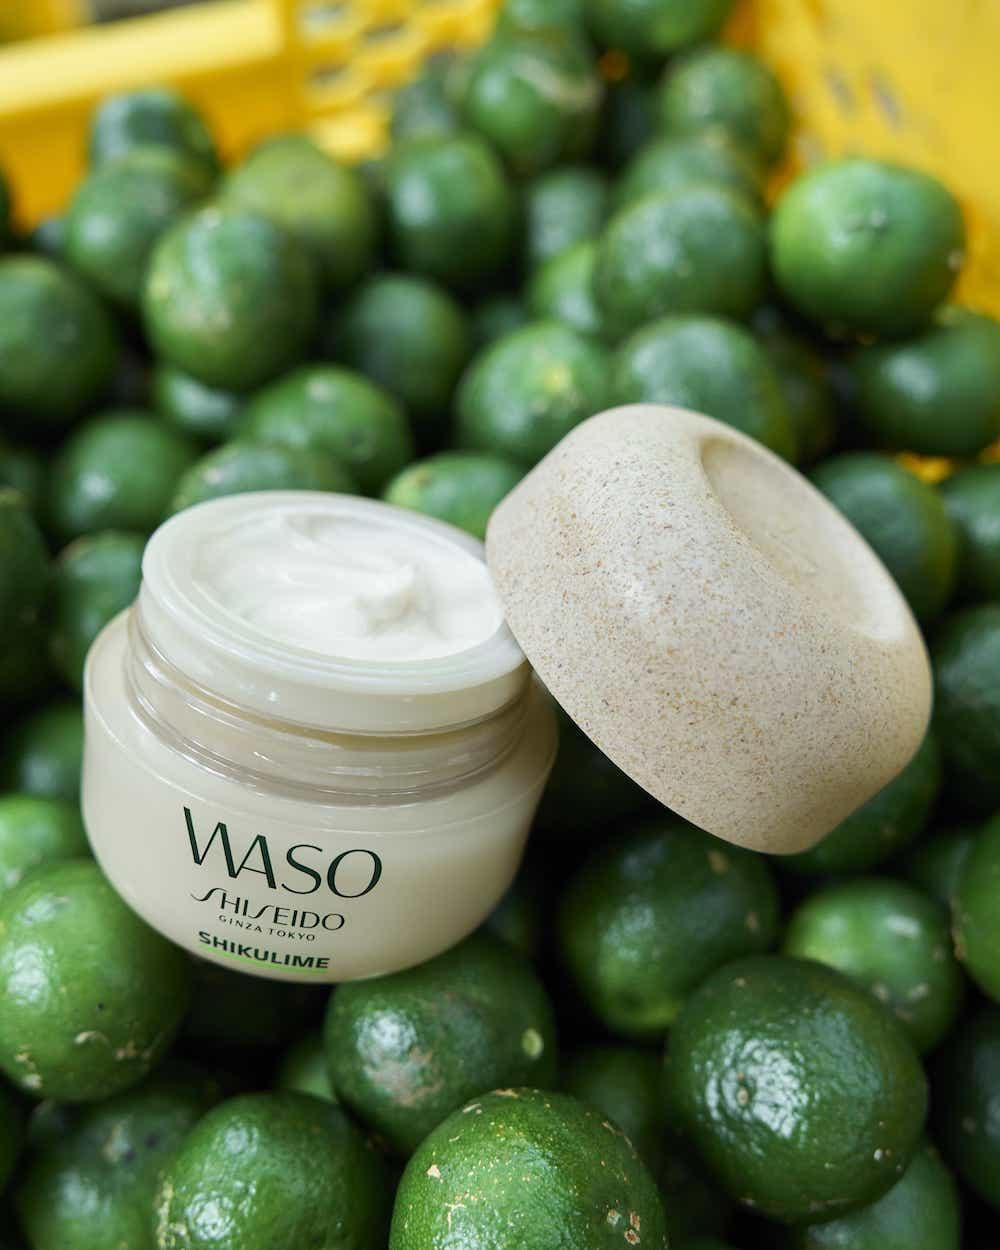 Shiseido WASO Shikulime Lime Giapponese